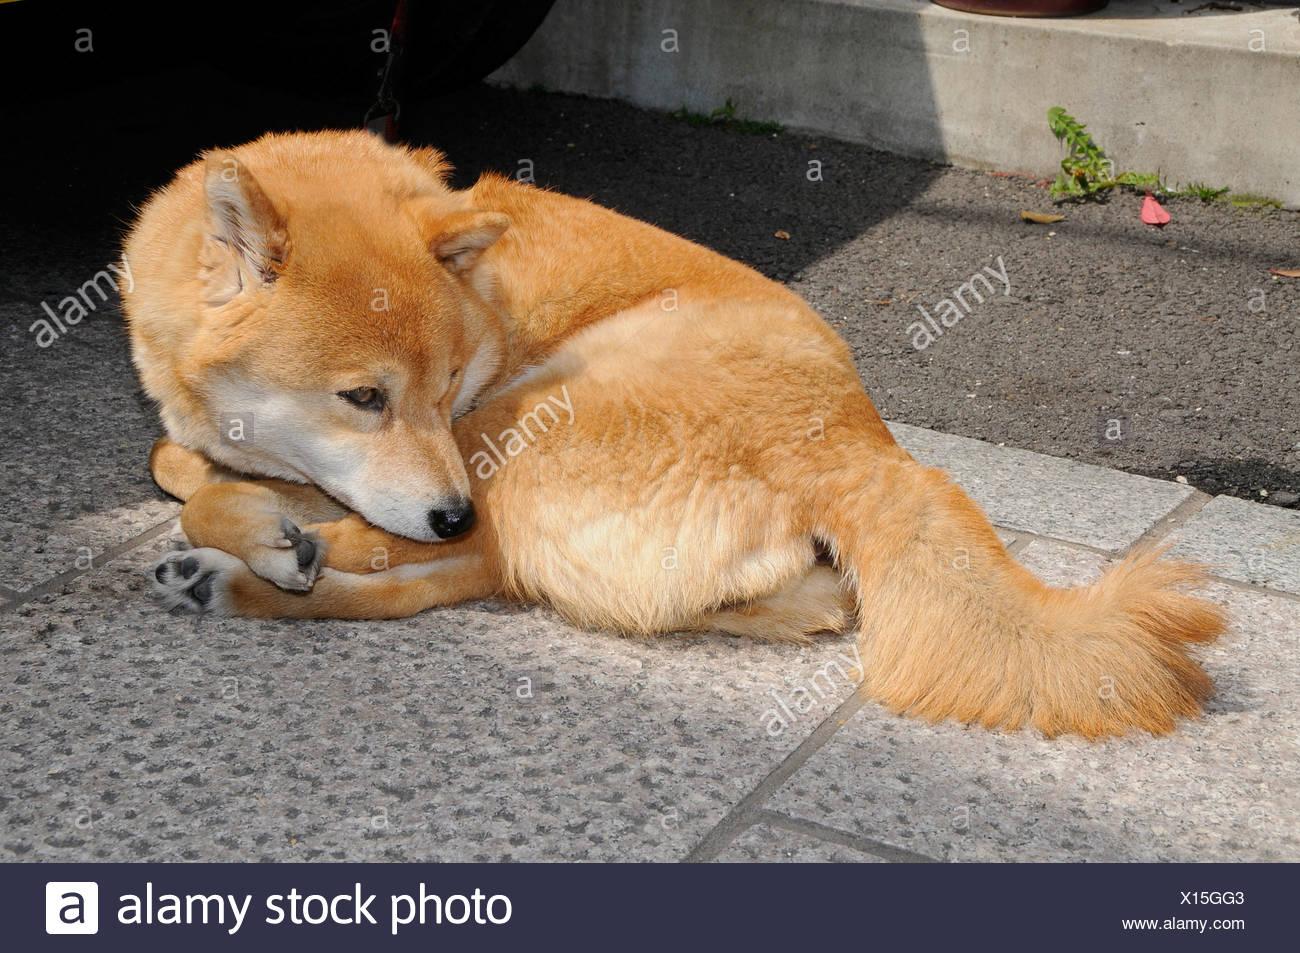 Hokkaido dog, Ainu dog, Ainu Inu, Hokkaido-Ken, Japanese dog breed, common pet dog, Kyoto, Japan, Asia - Stock Image